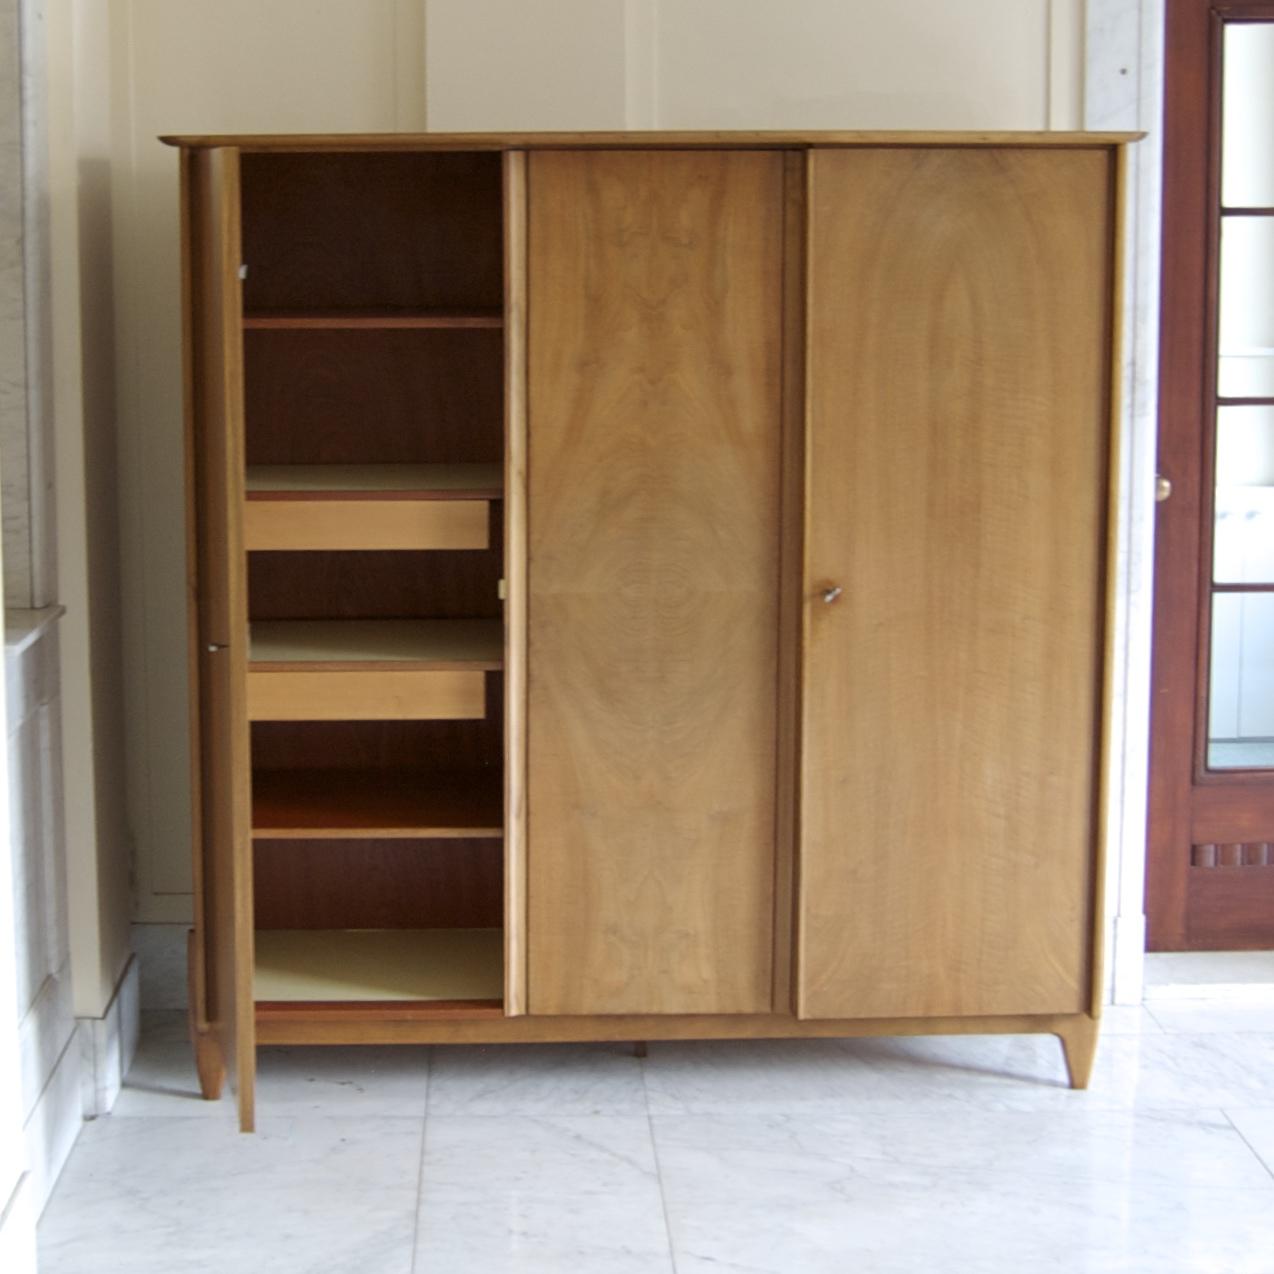 Jaren 50 linnenkast kledingkast op mooi onderstel gebroeders van duijn - Kledingkast en dressoir ...